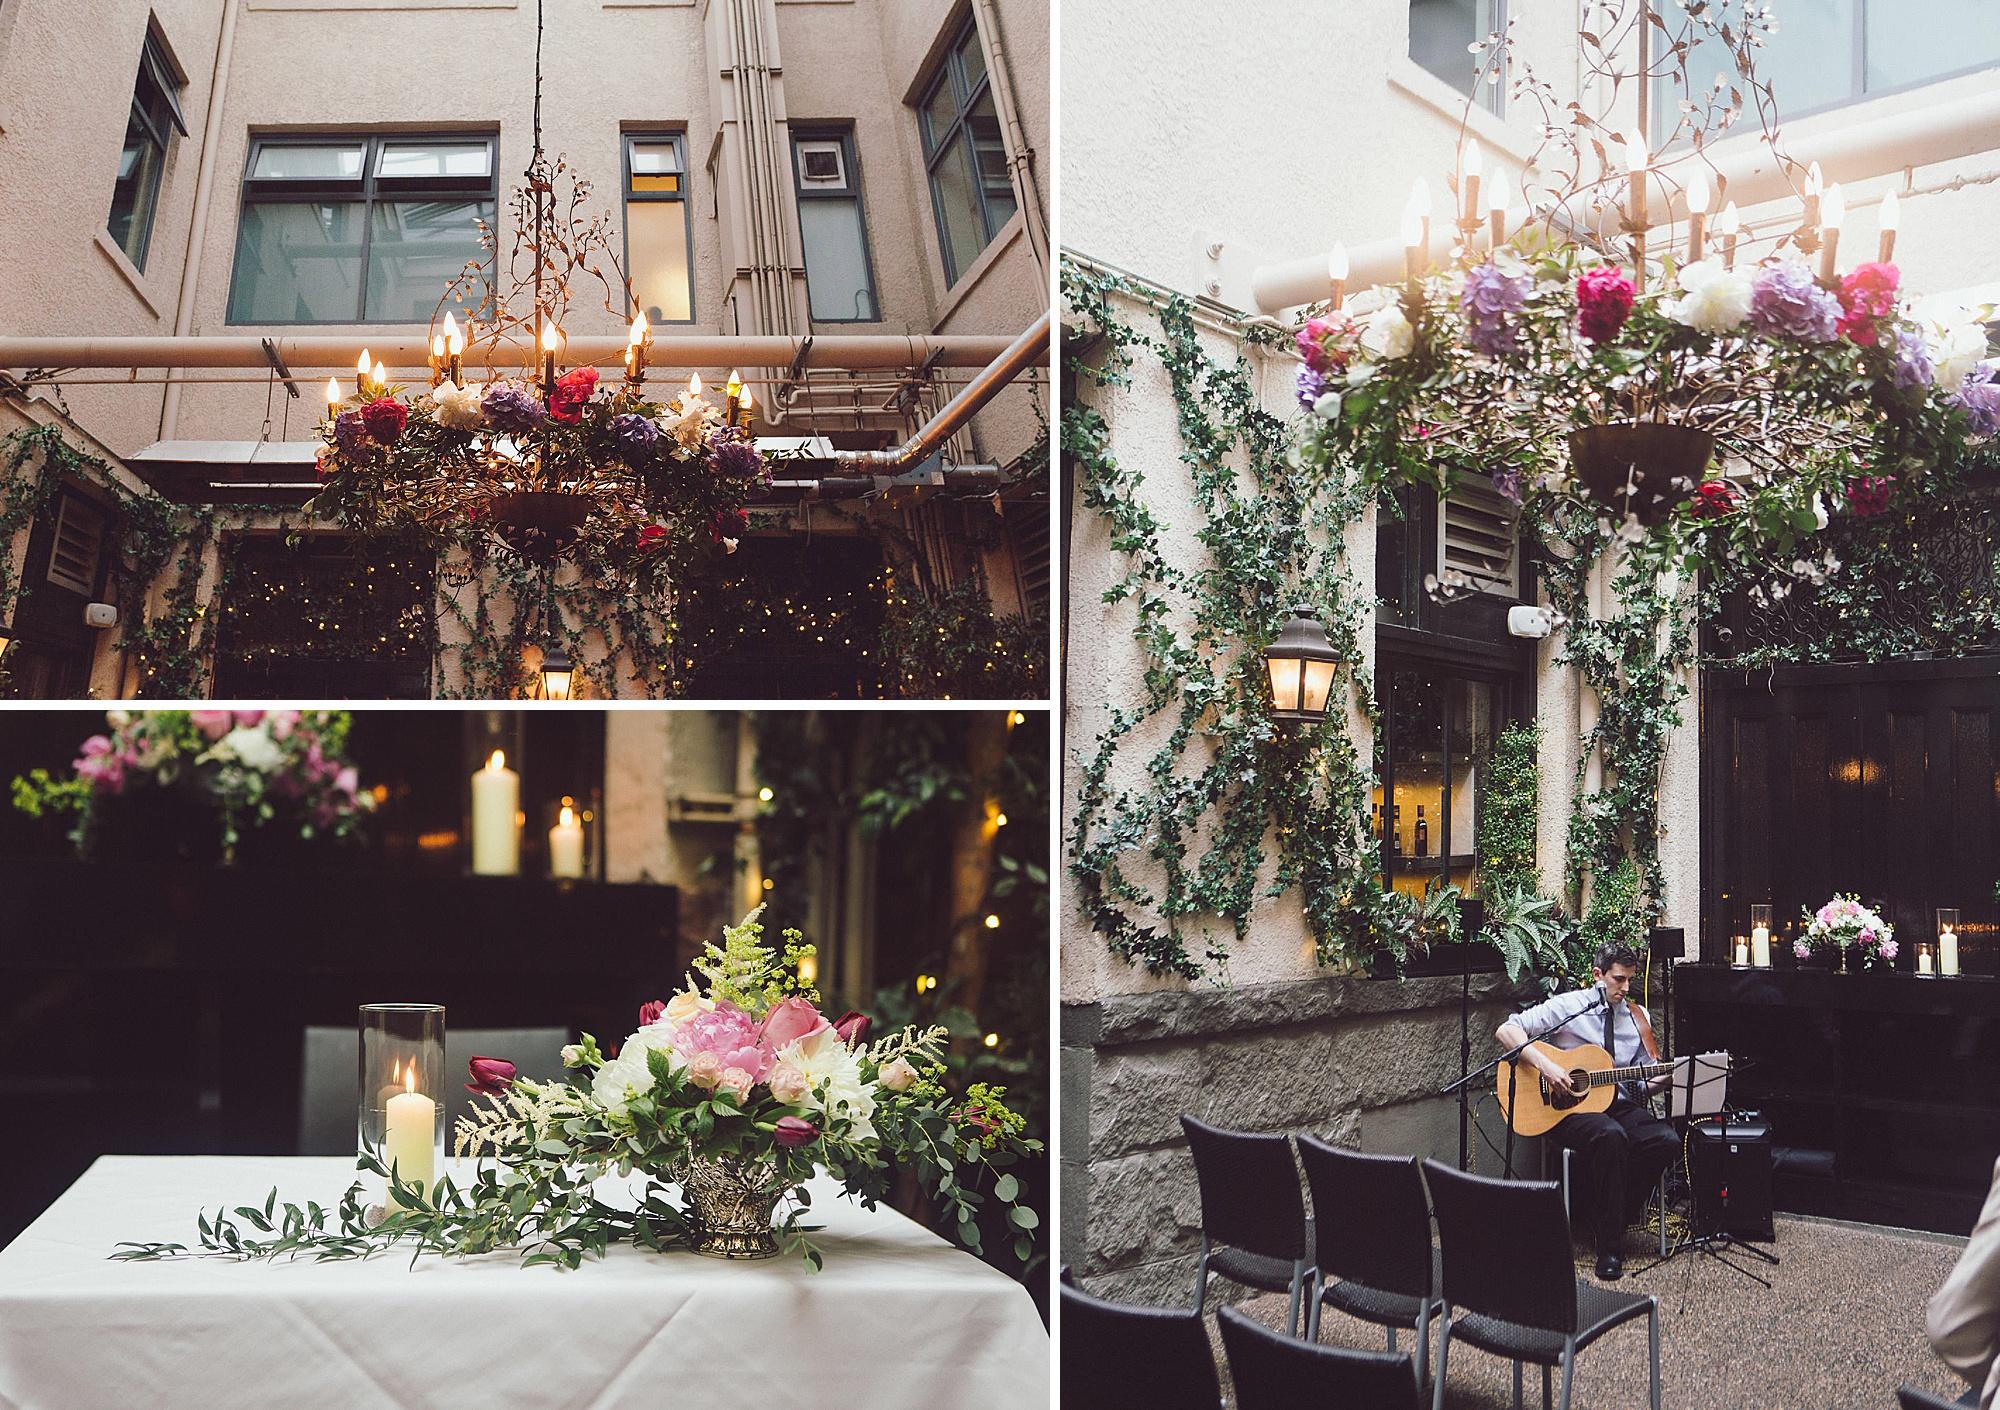 Wedding greenery decor